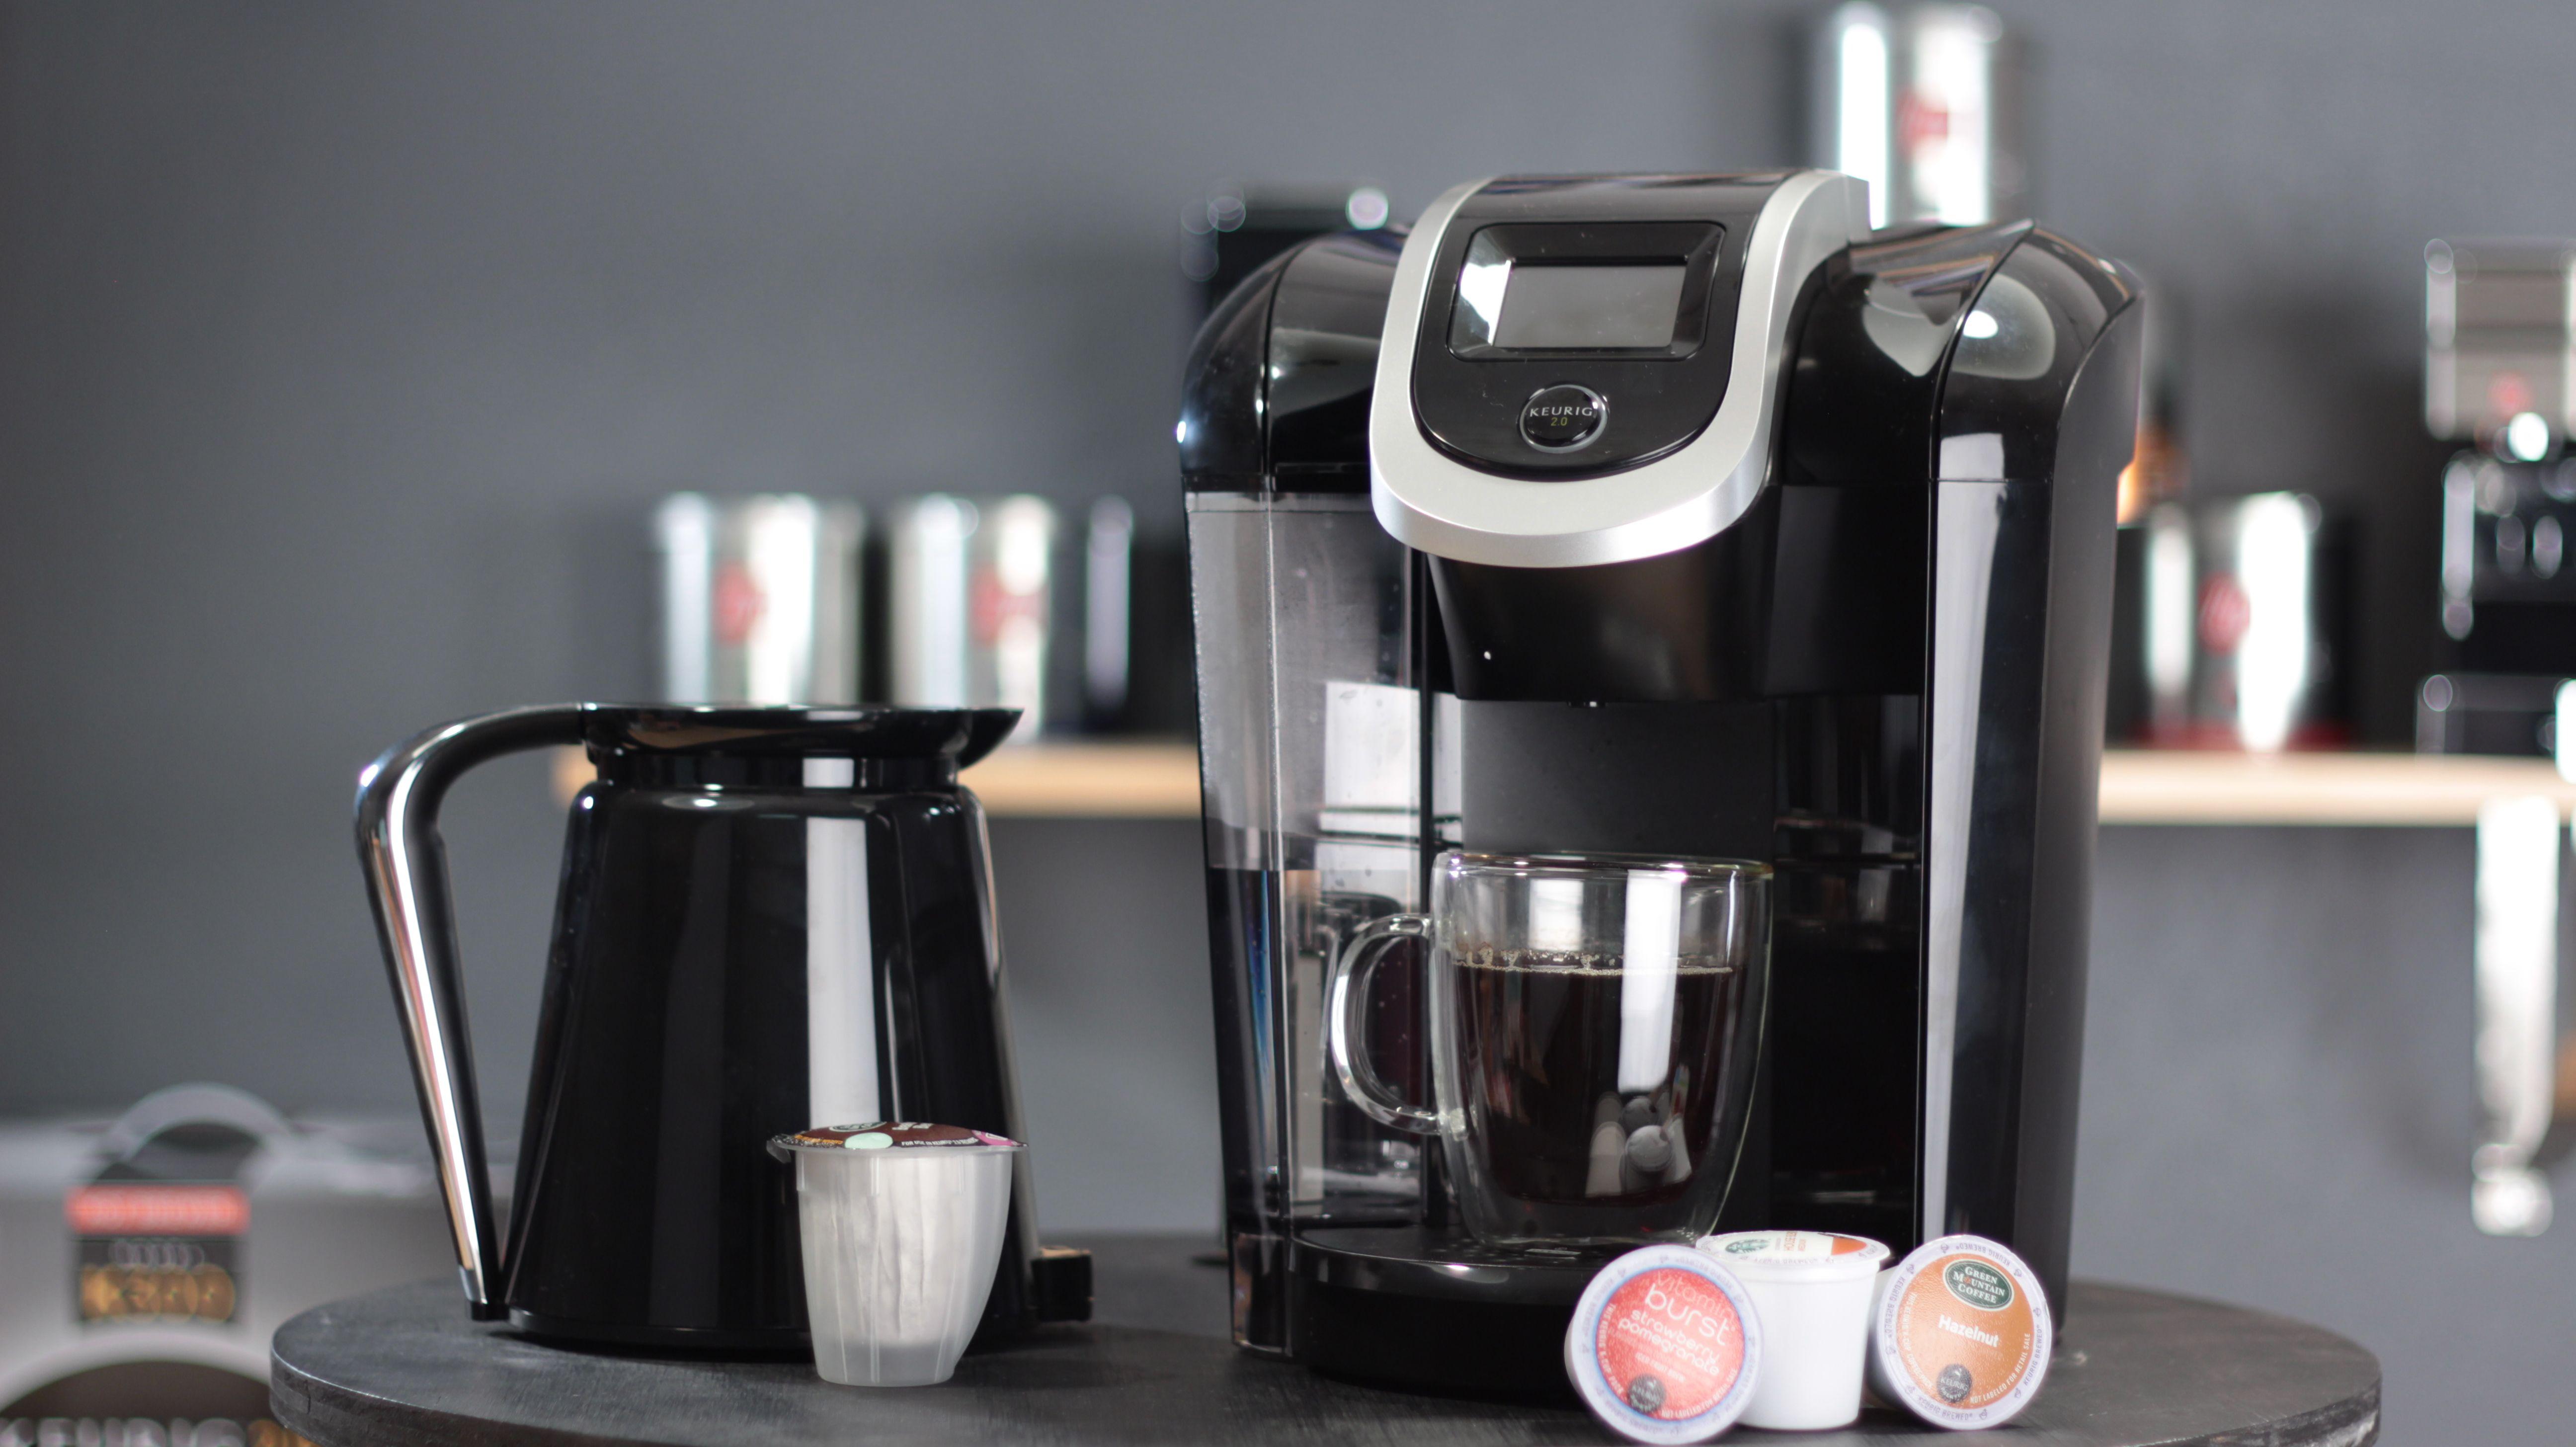 Keurig 2.0 K300 Coffee Maker with Carafe Coffee maker